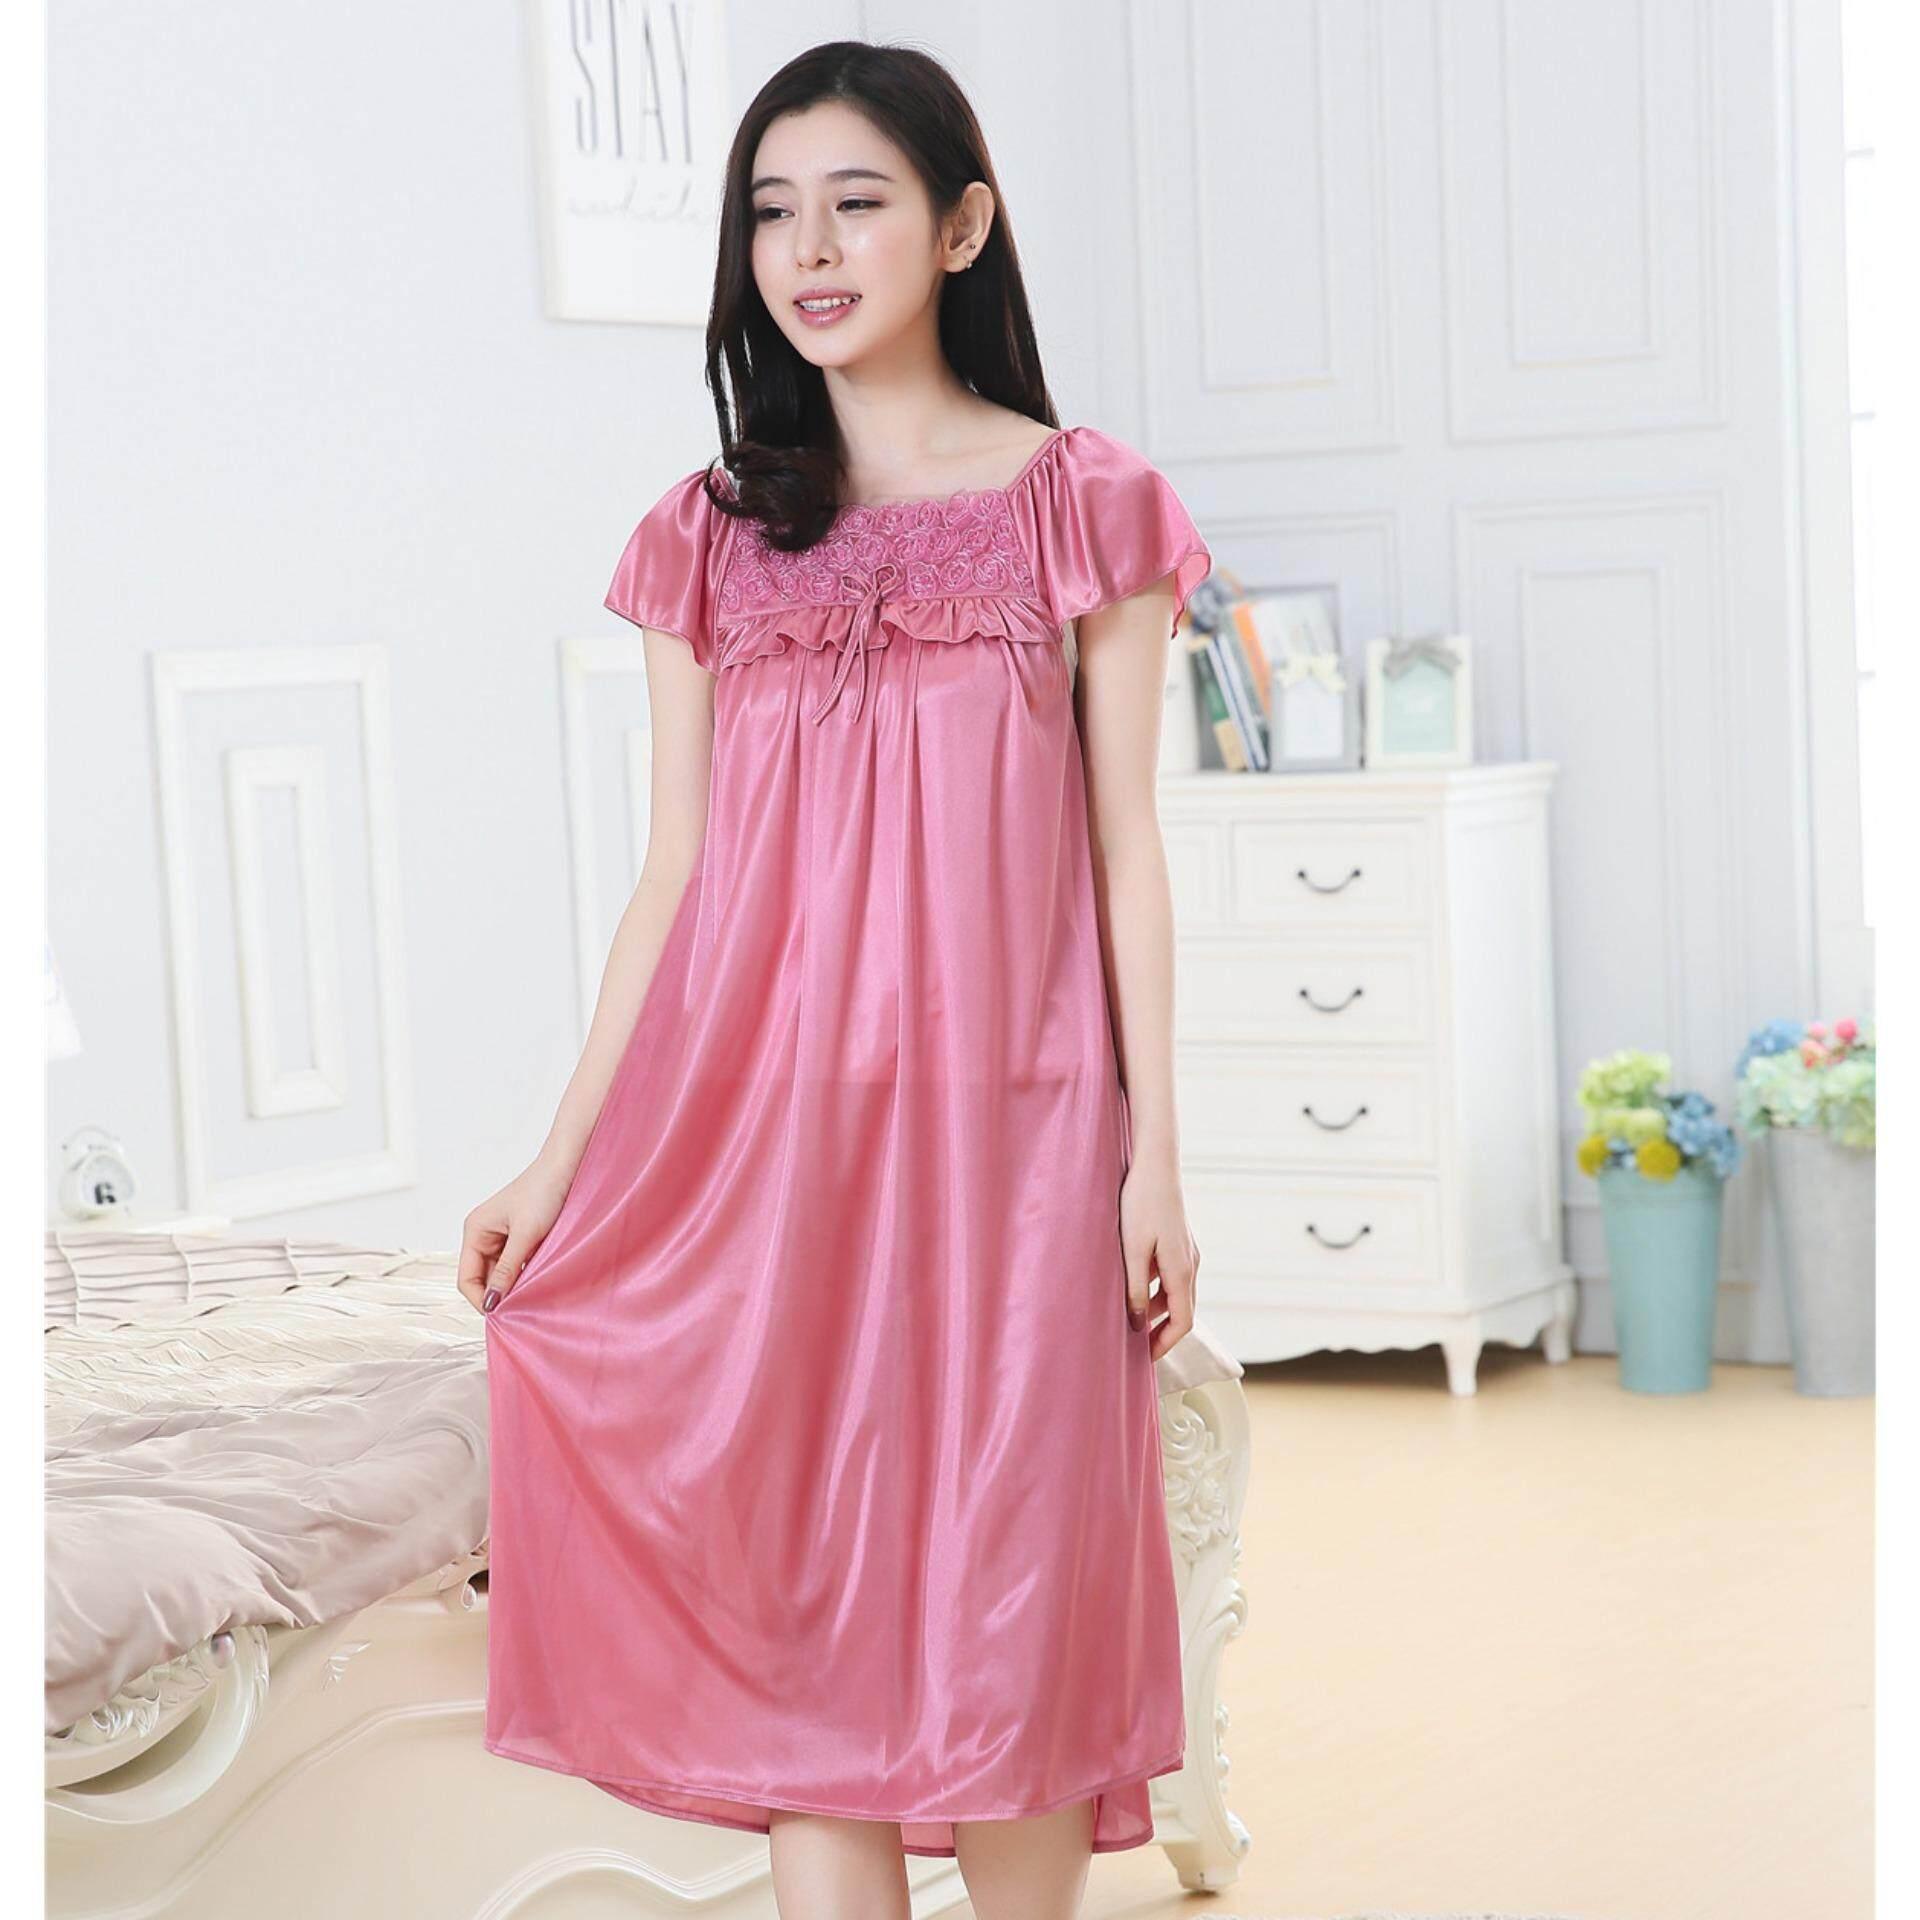 e364f55ca Bolster Store Ladies Women Sleepwear Sexy Lingerie Pajamas Long ...